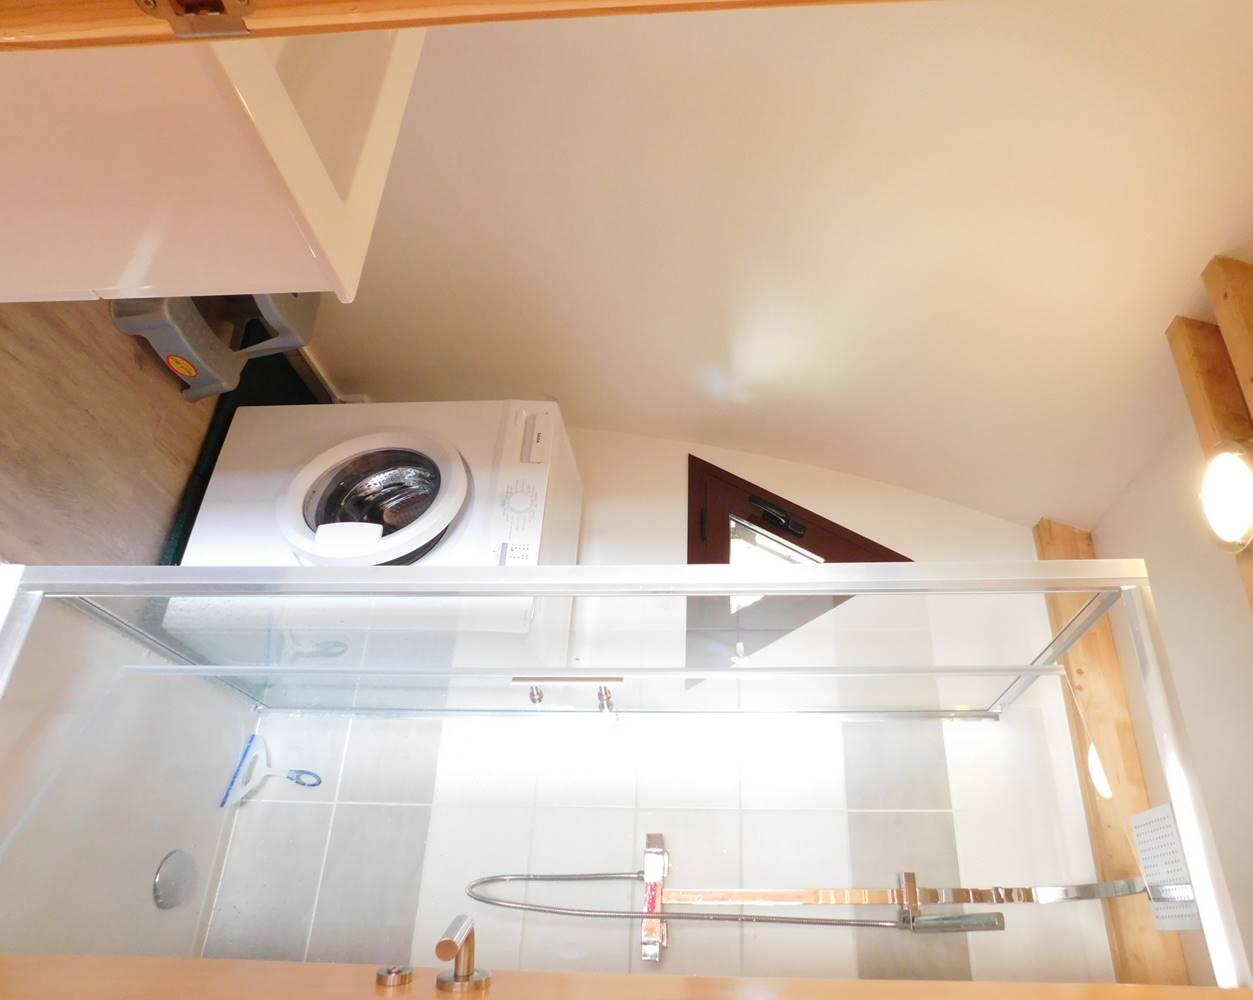 TY FOUKENN - salle d'eau grand angle - lave linge (insolite location-morbihan-sud.com 0602362422) ©